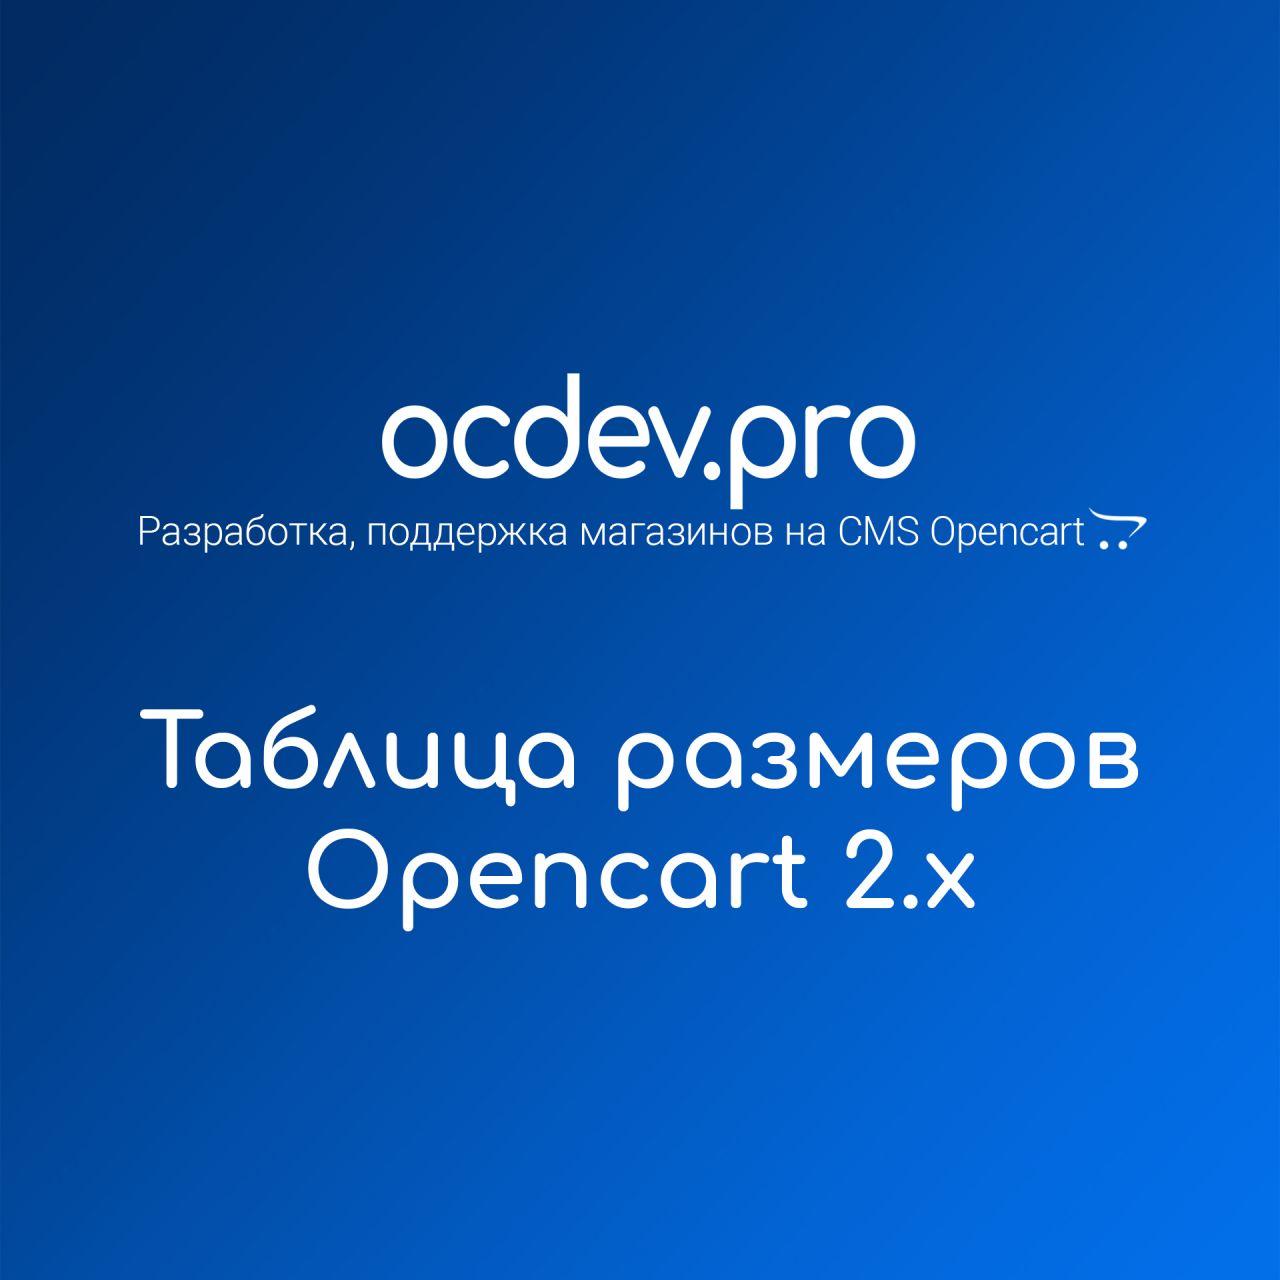 OCDEV.pro - Таблица размеров Opencart 2.x из категории Модули для CMS OpenCart (ОпенКарт)